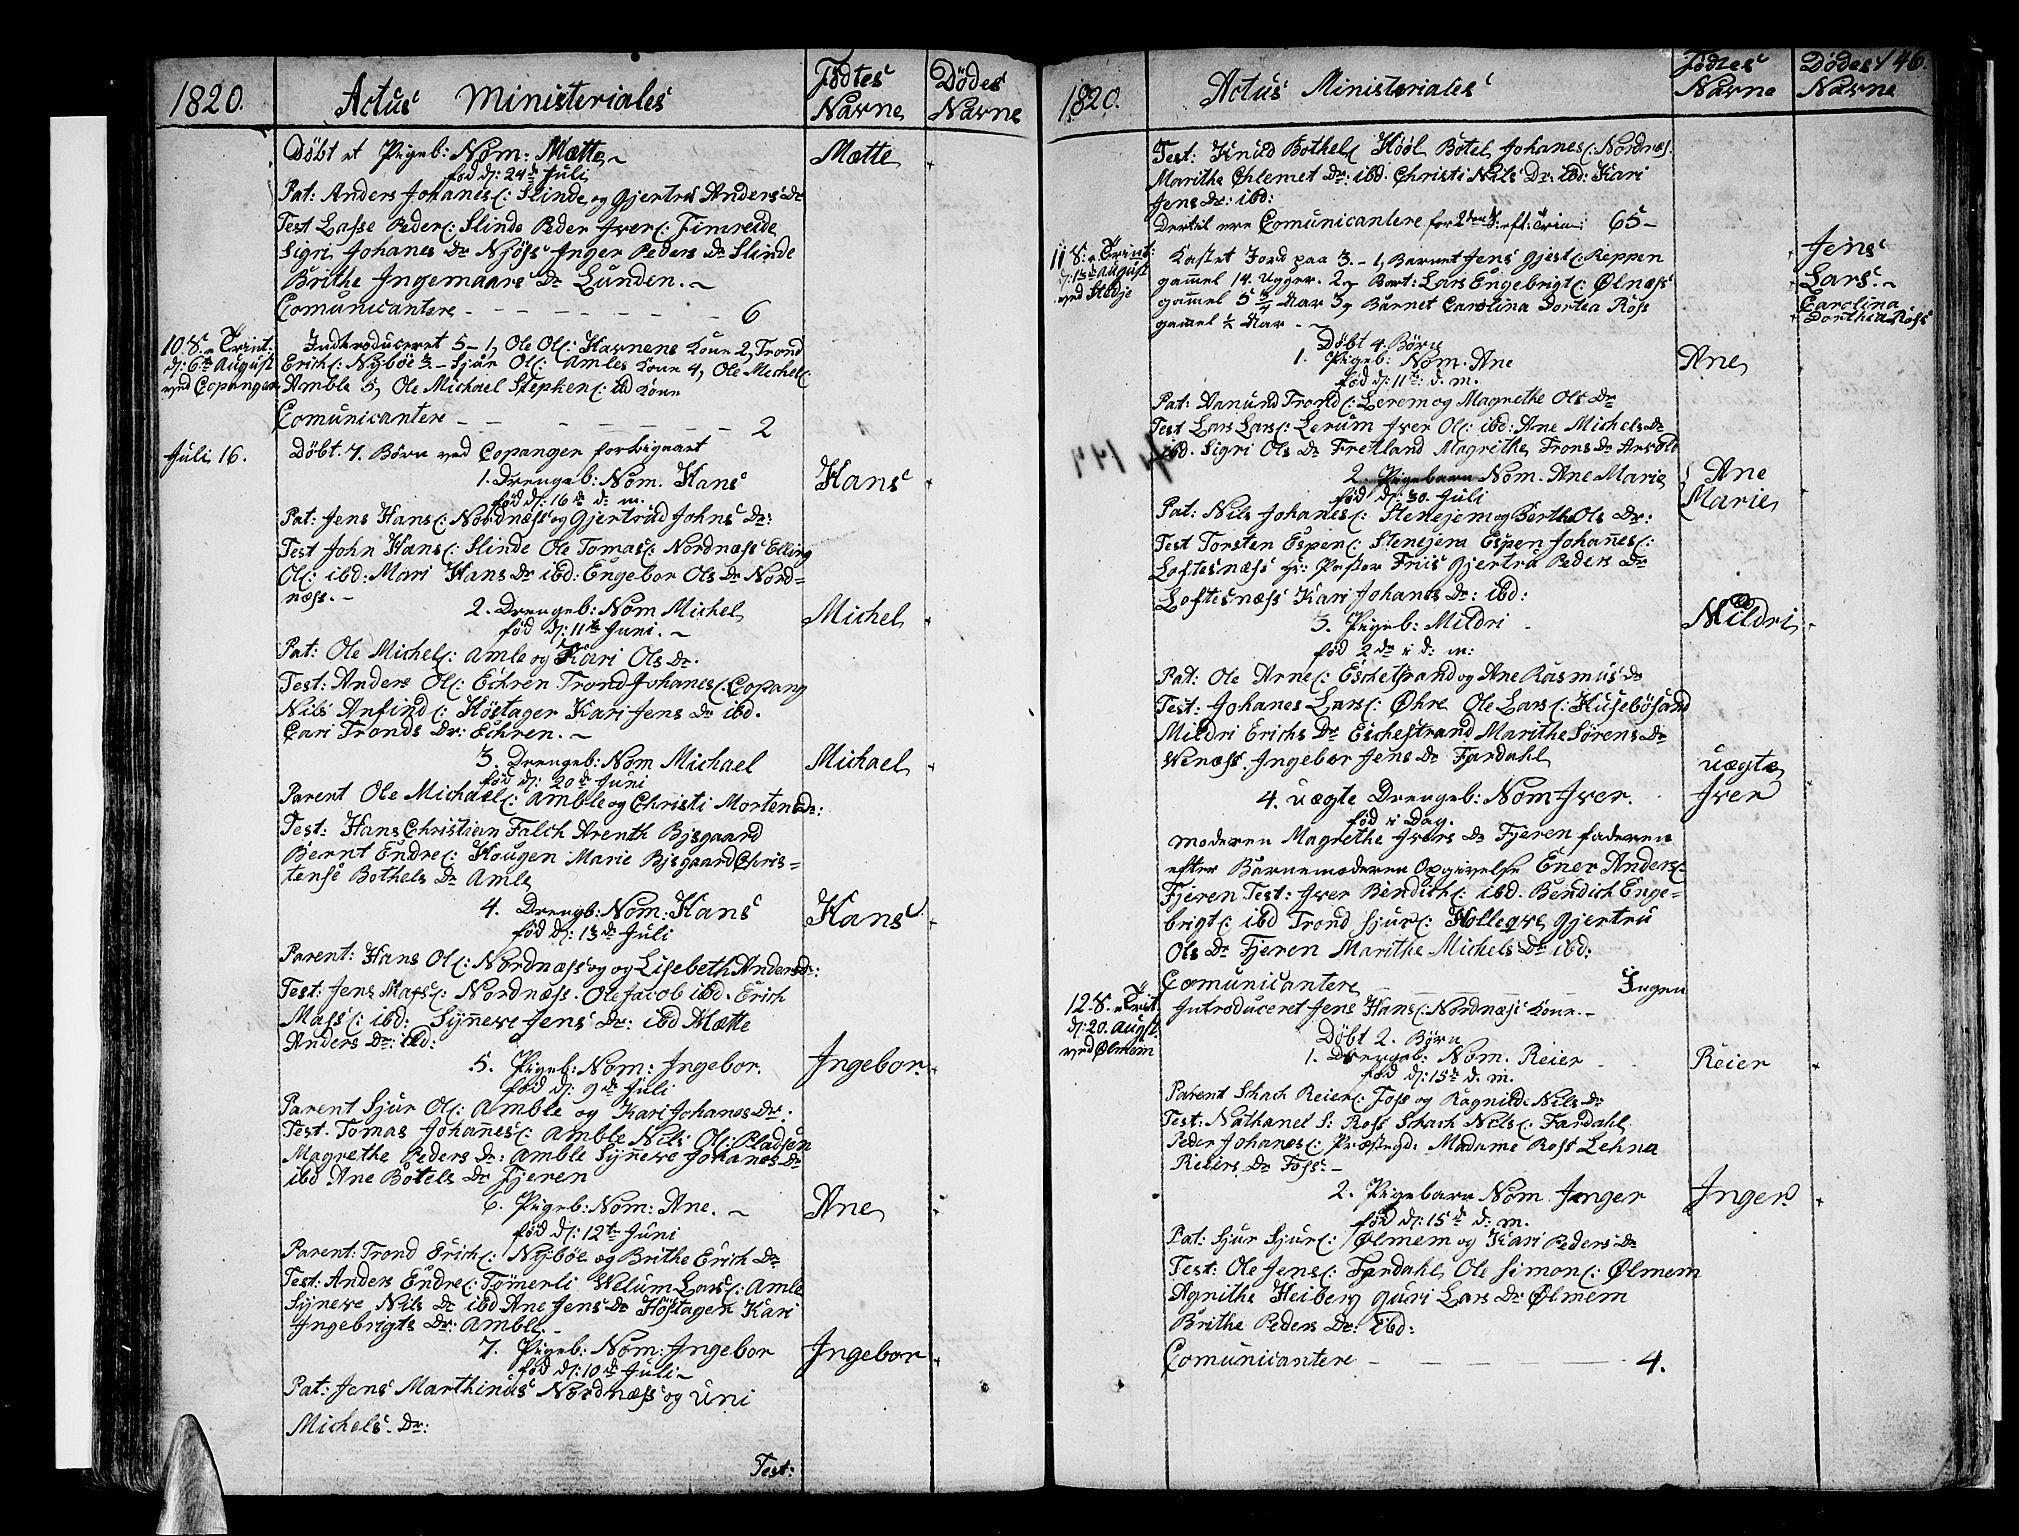 SAB, Sogndal sokneprestembete, H/Haa/Haaa/L0009: Parish register (official) no. A 9, 1809-1821, p. 146